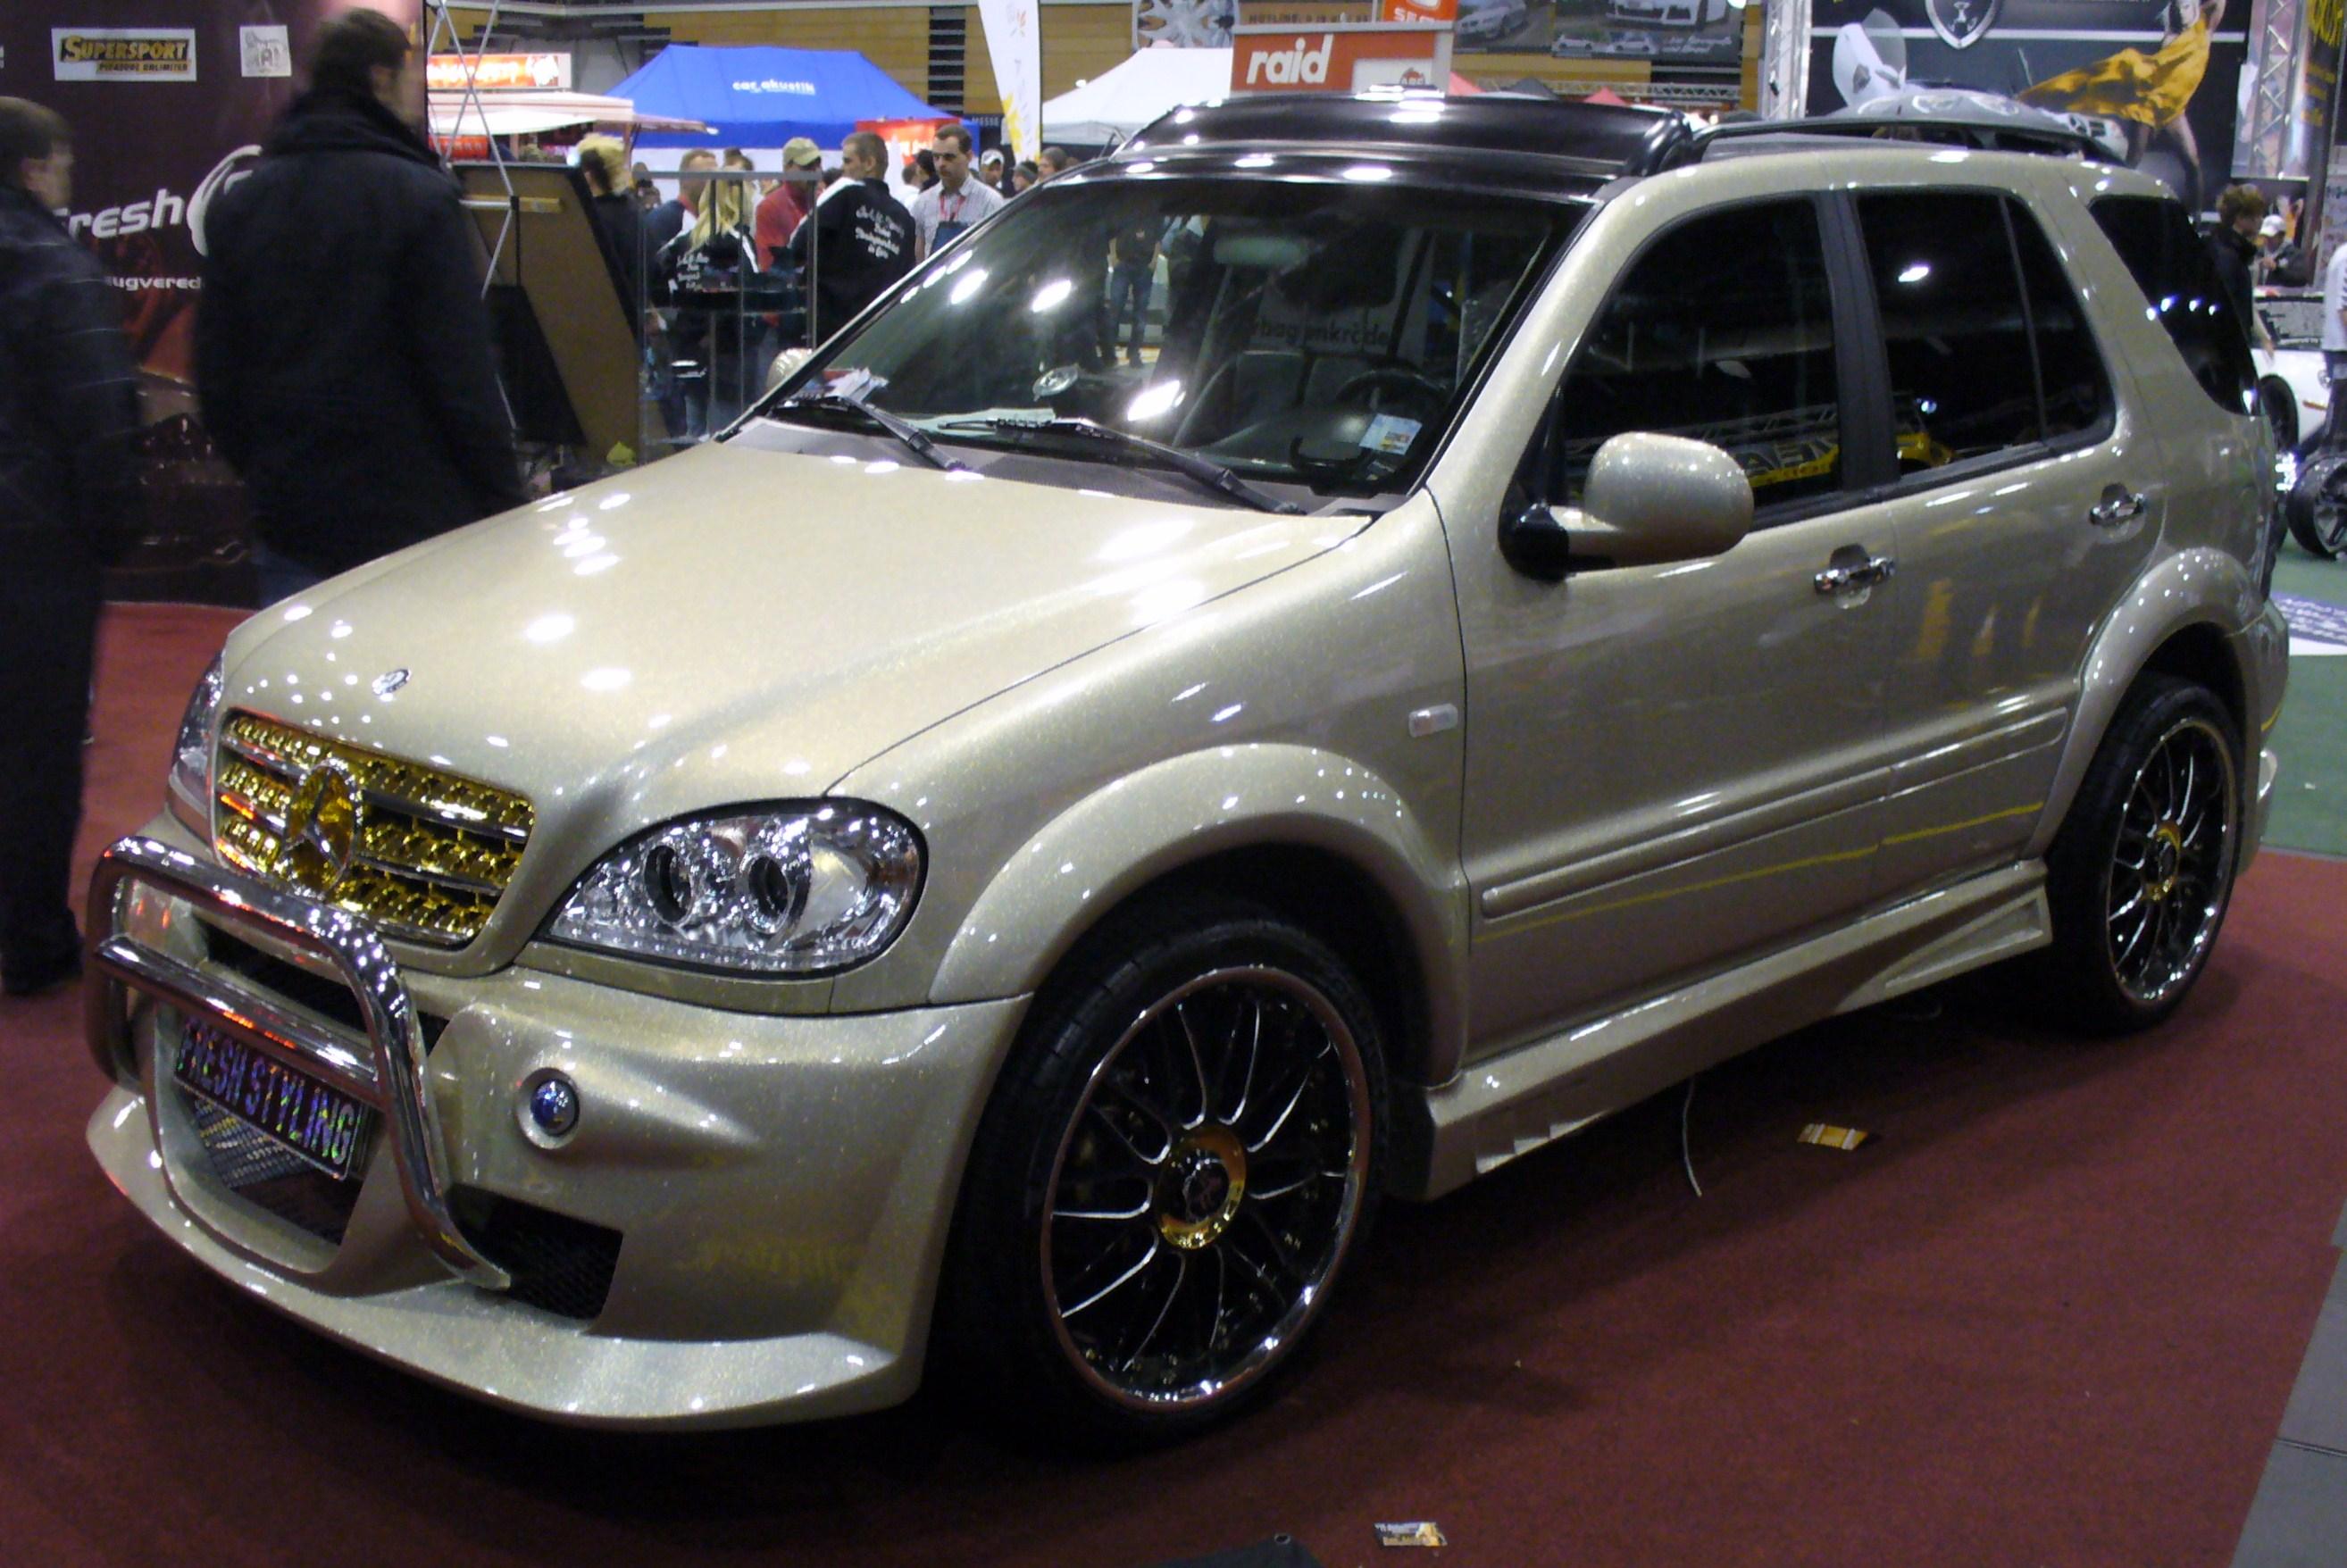 File:Mercedes-Benz W163 Tuning.JPG - Wikimedia Commons